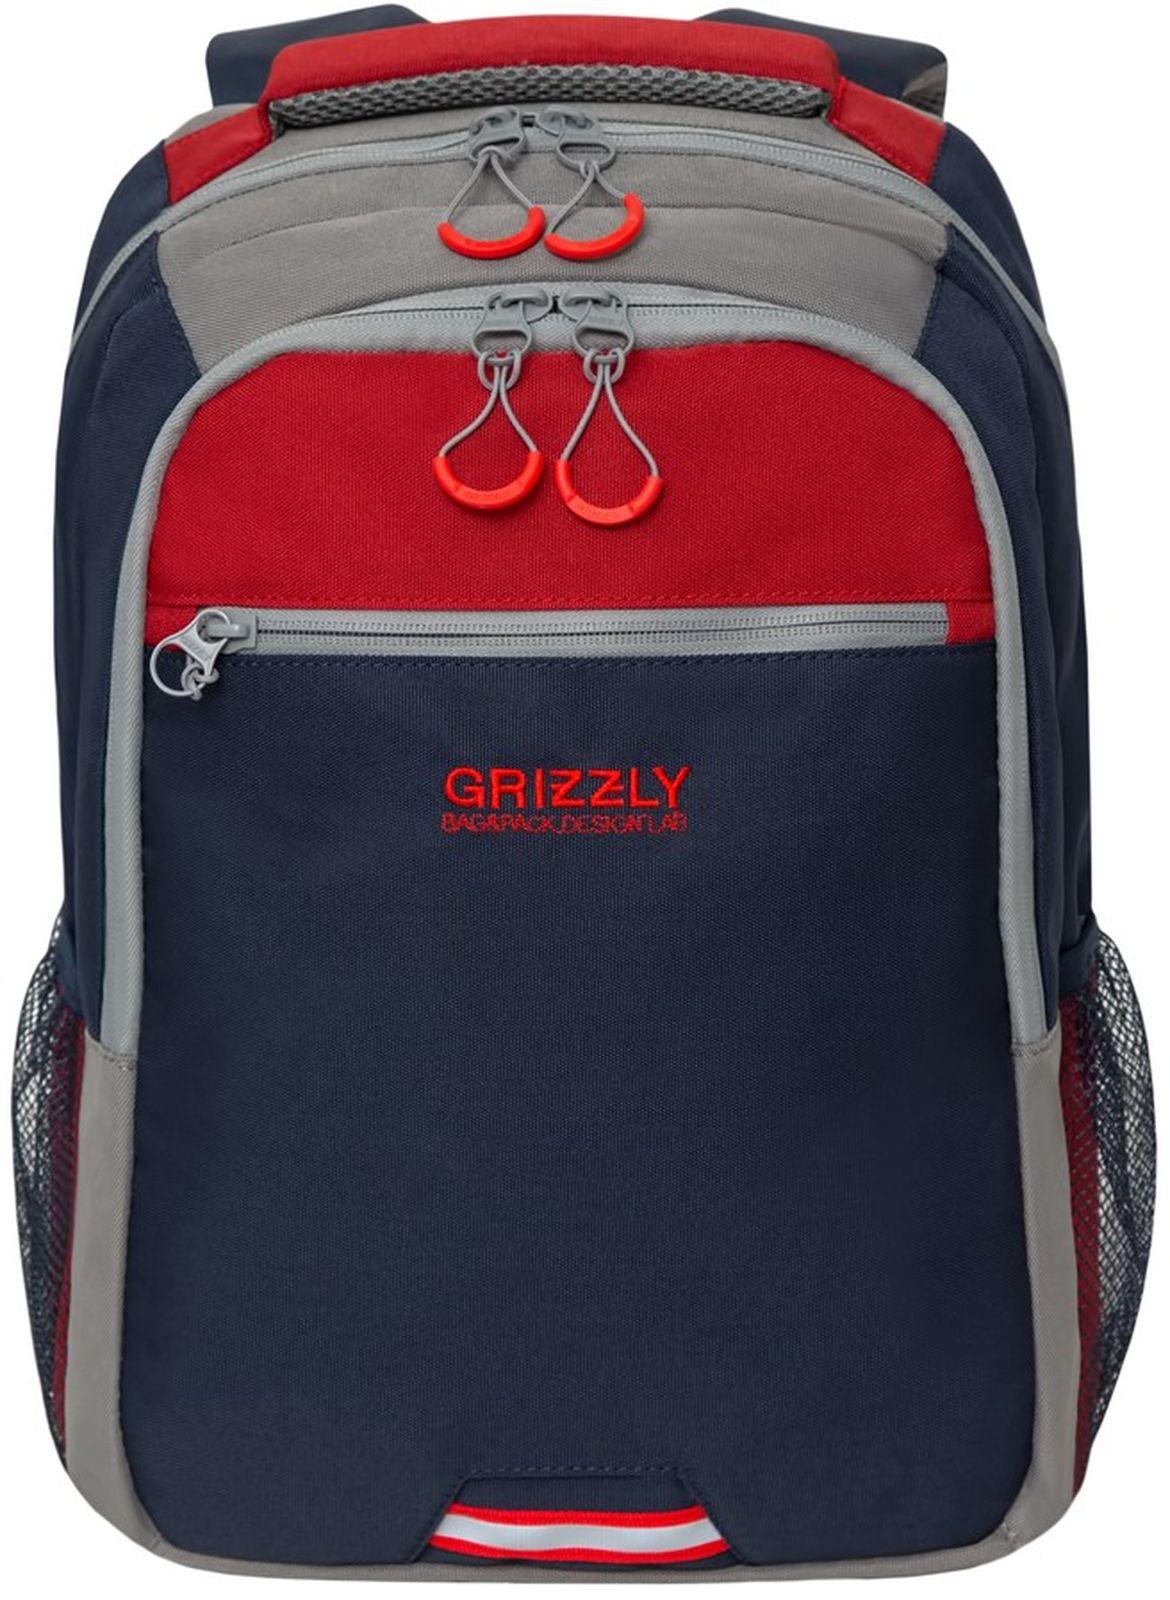 Рюкзак Grizzly, RU-922-3/2, красный, синий рюкзак молодежный grizzly 16 л ru 808 2 2